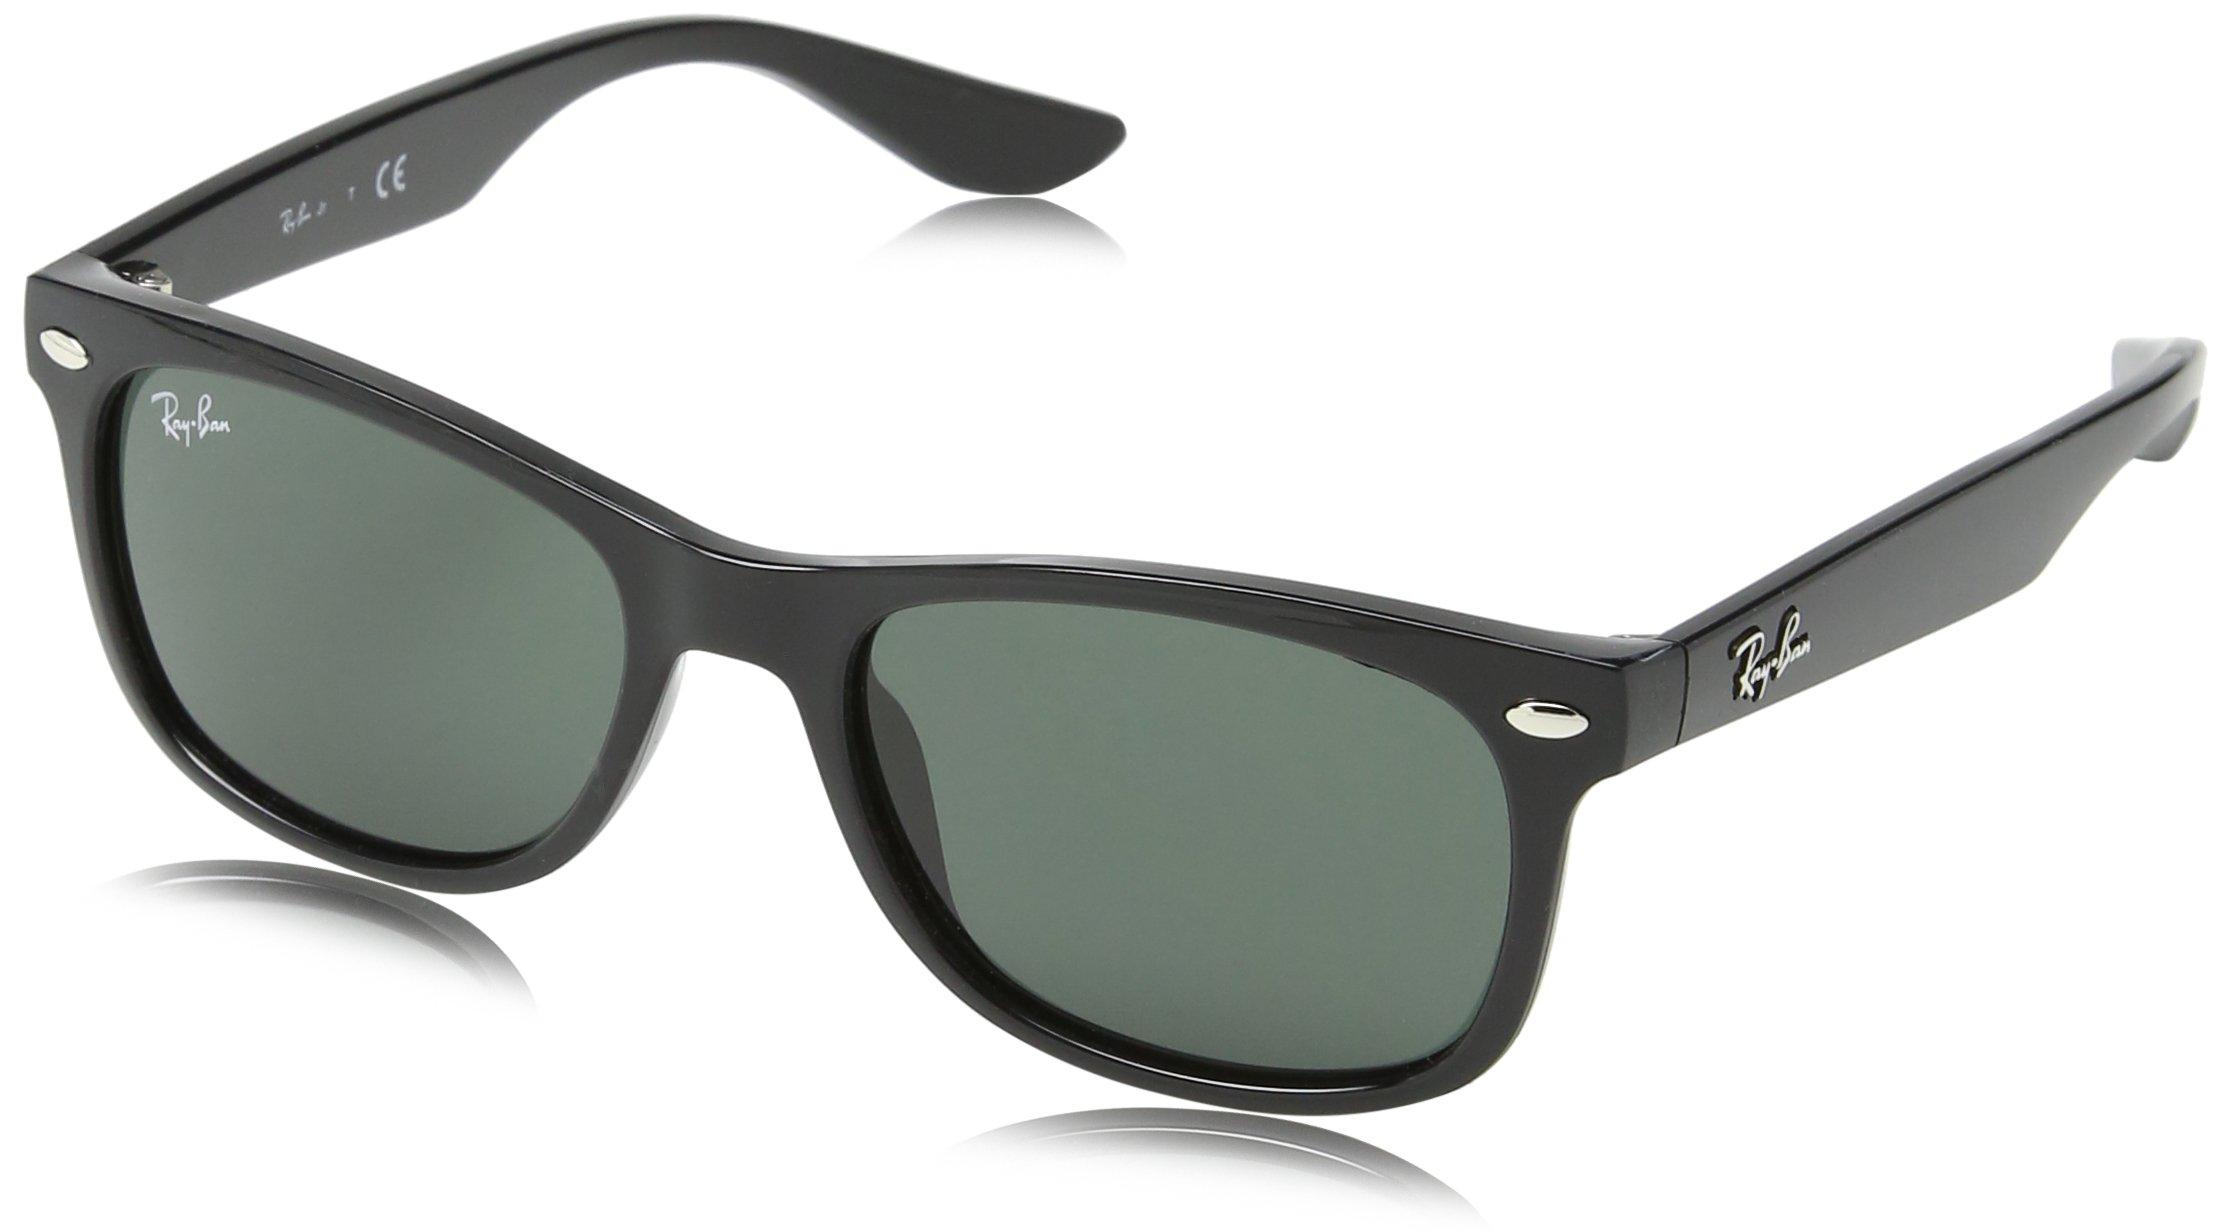 Ray-Ban Kids' New Wayfarer Junior Square Sunglasses, Black 100/71, 48 mm